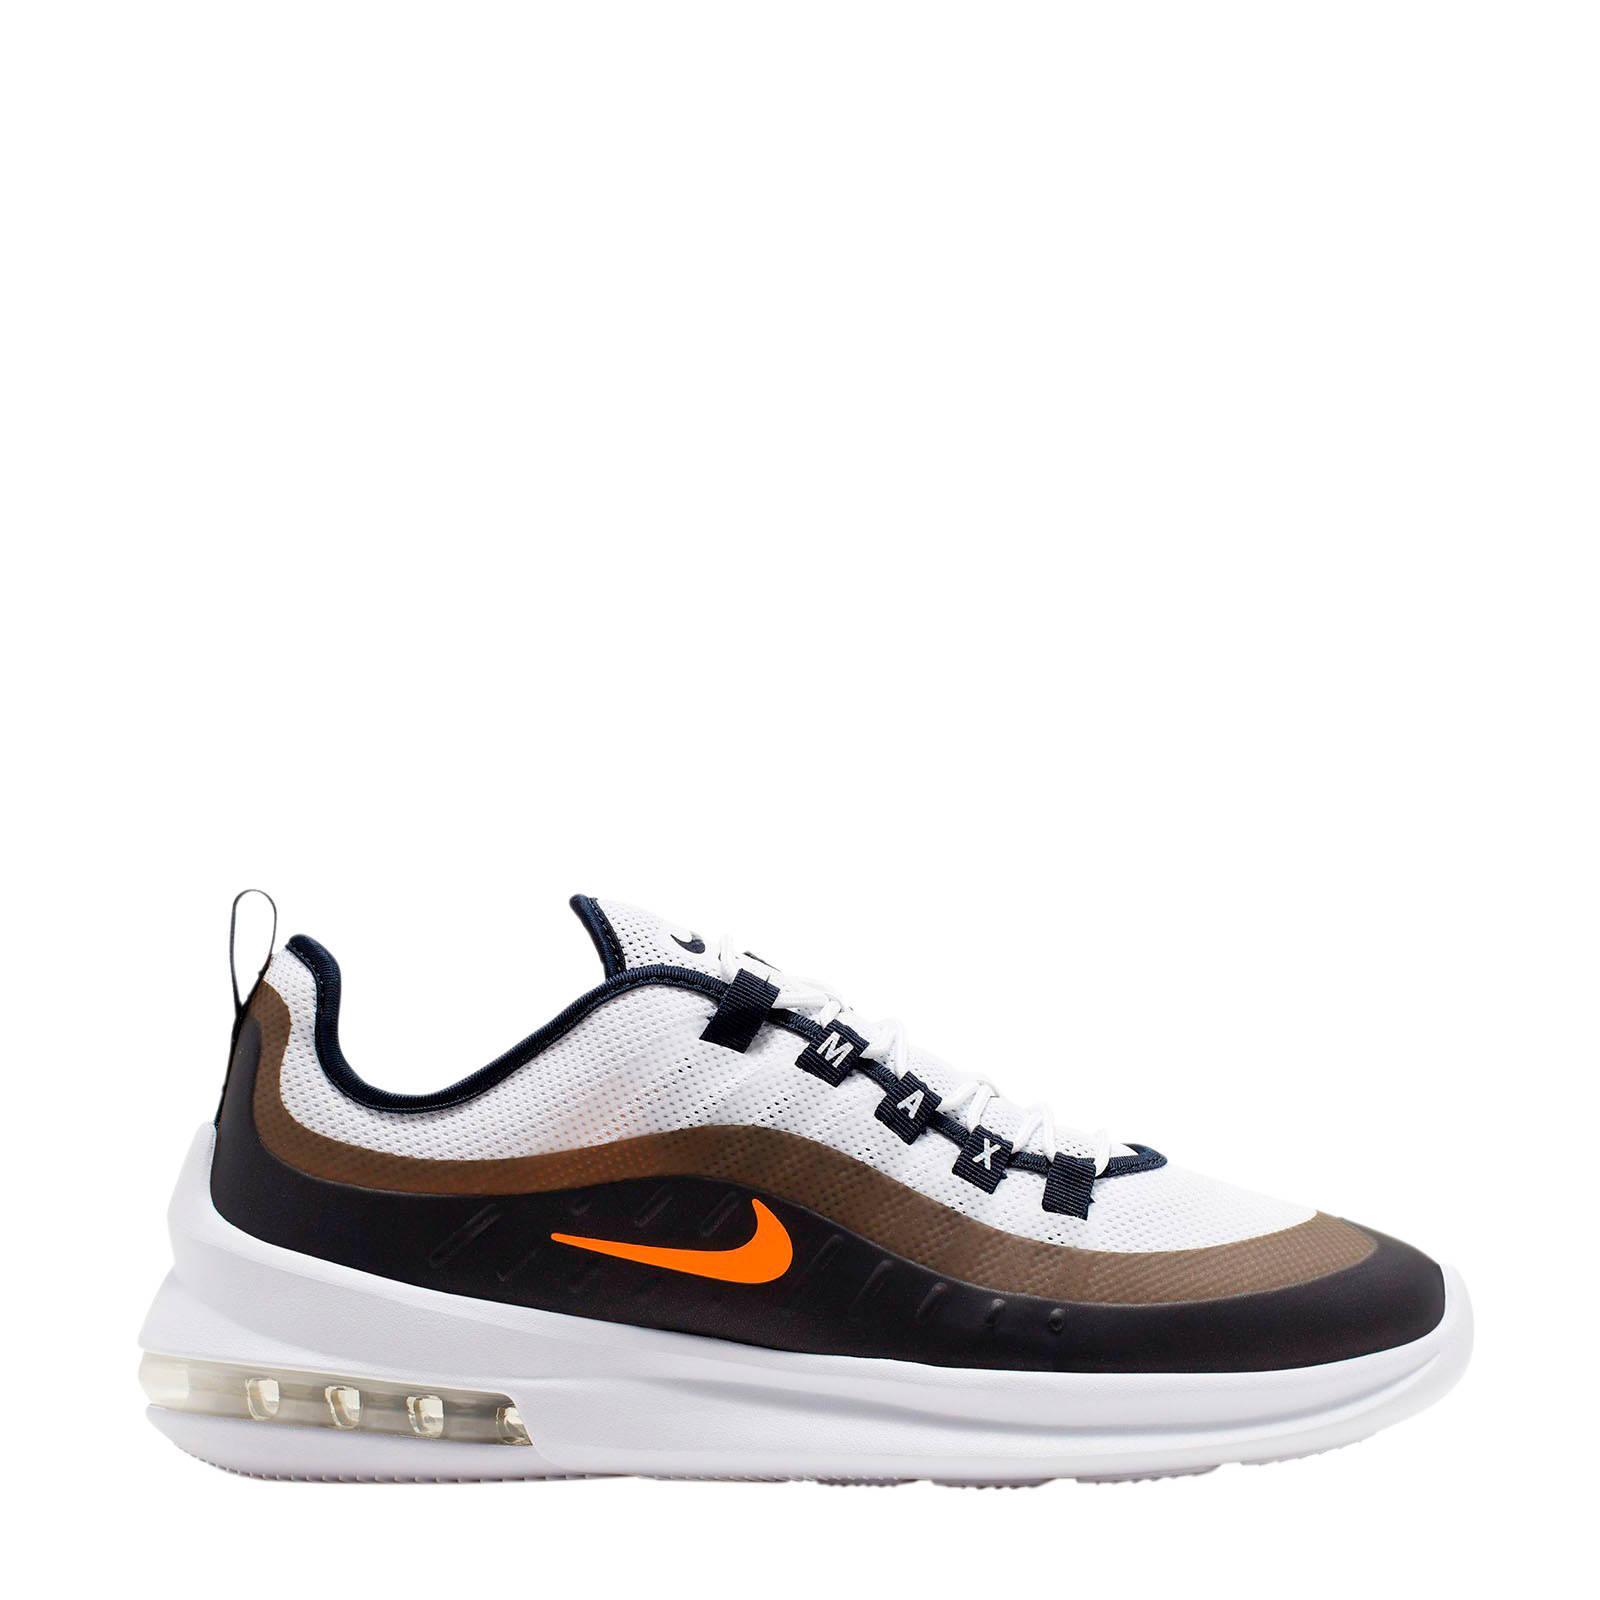 Nike Air Max Axis Sneaker Wit Zwart Oranje